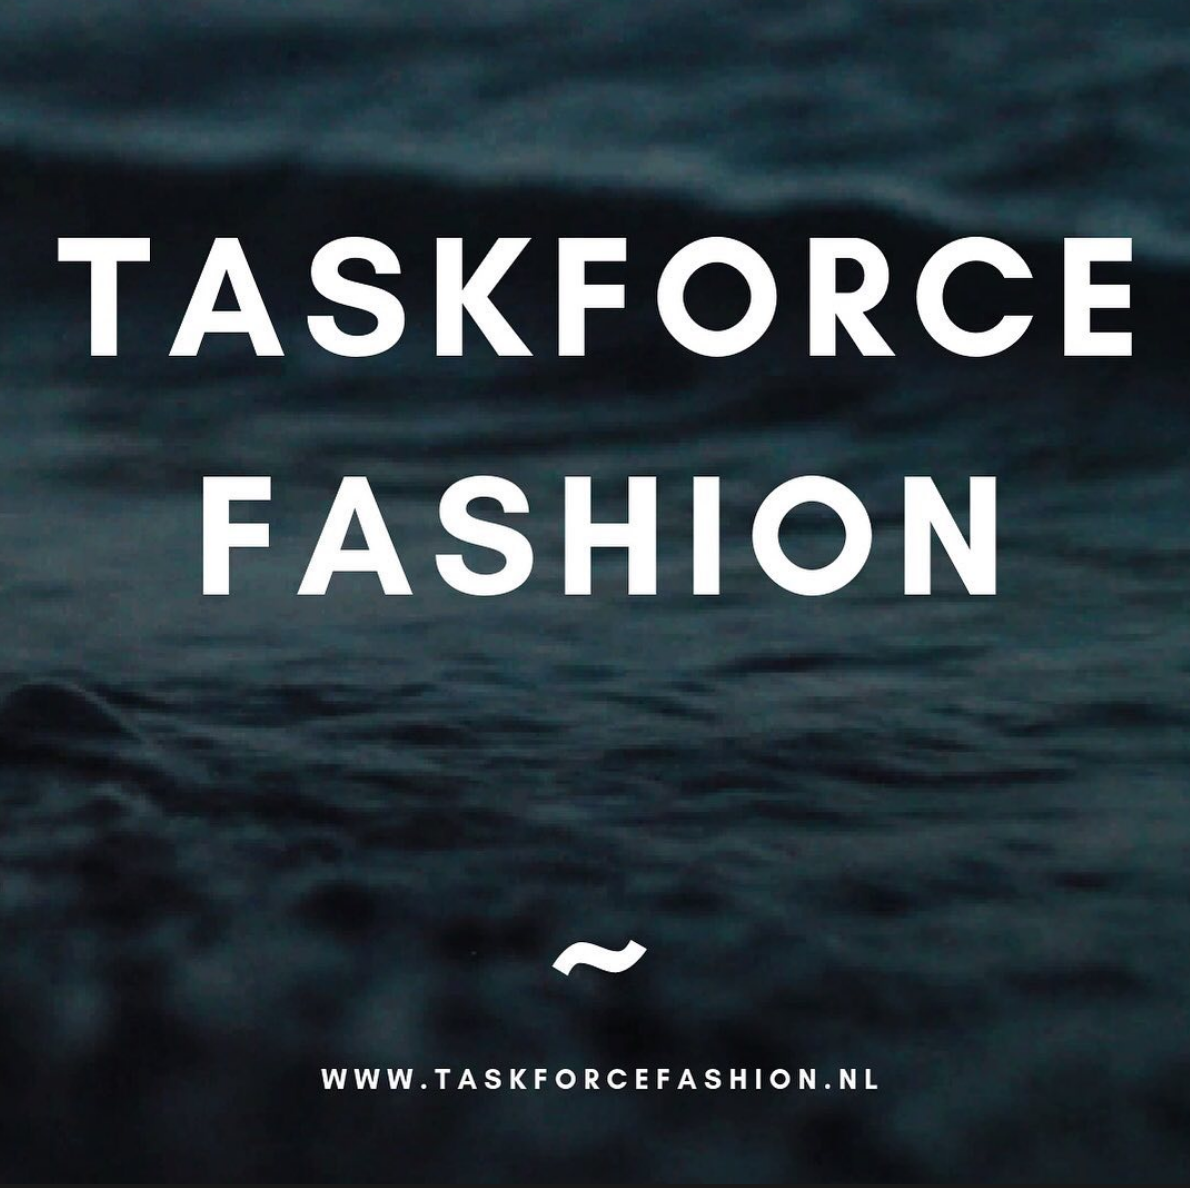 taskforce fashion.png